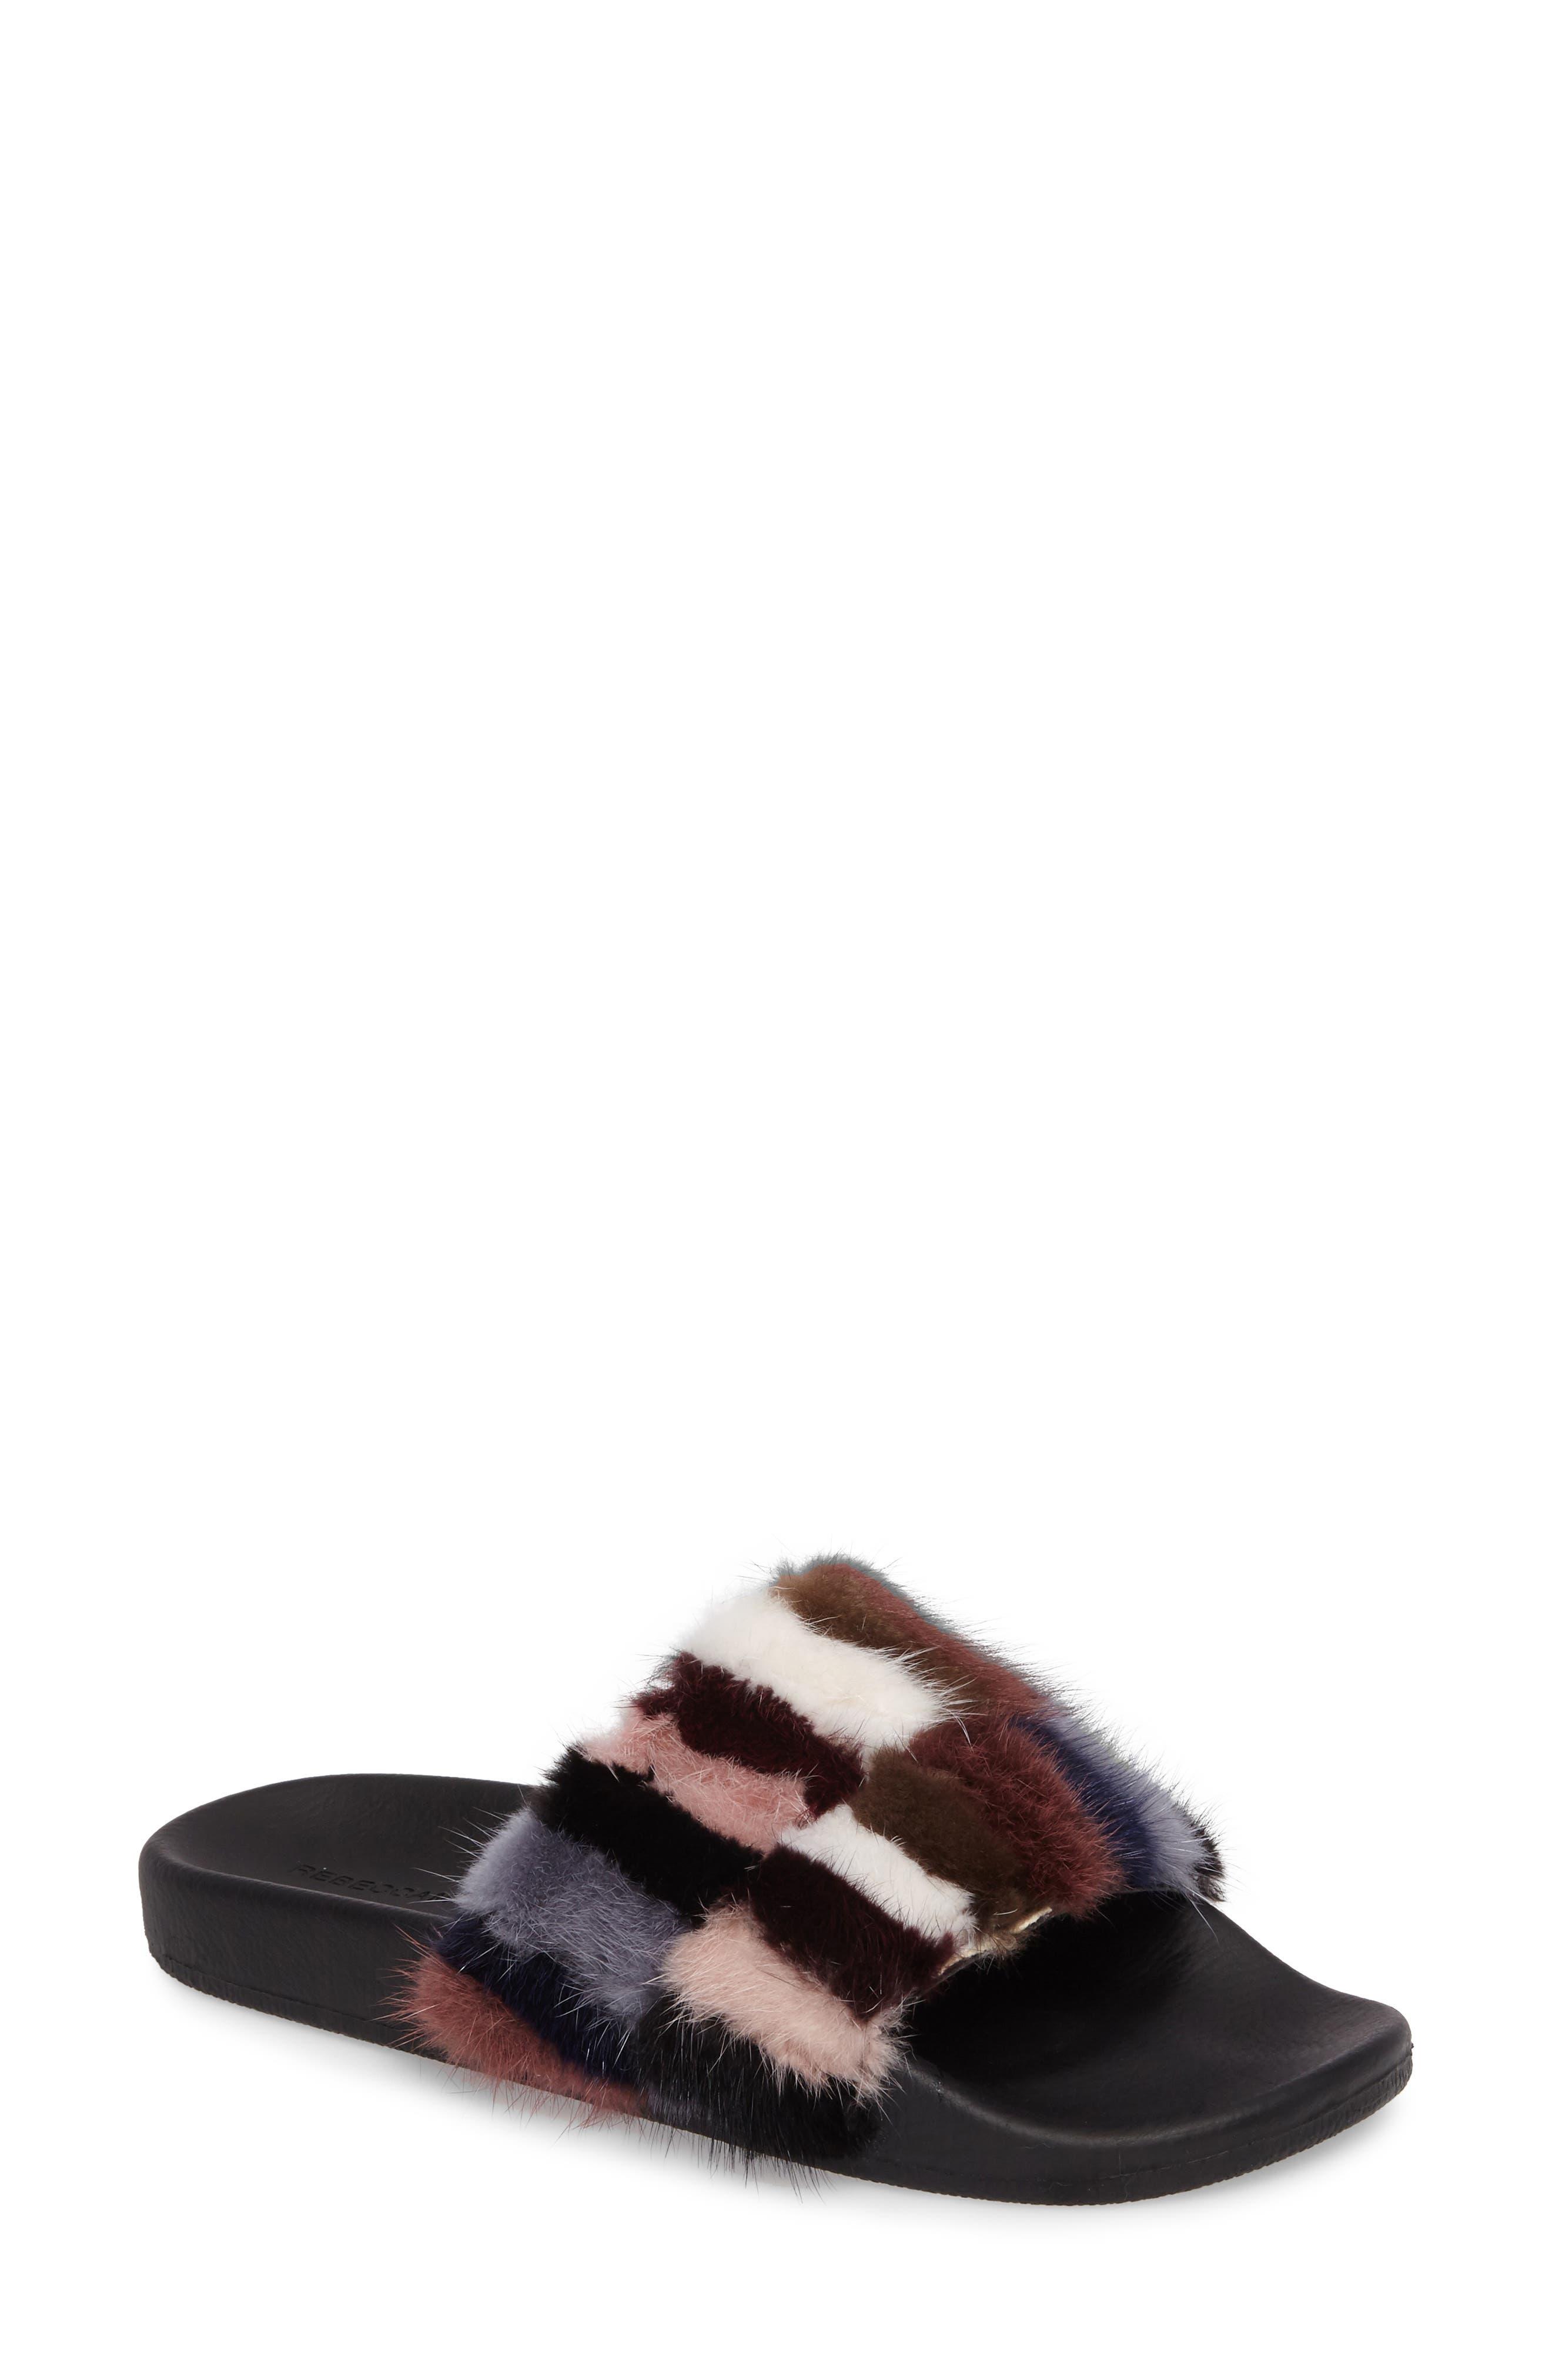 Sammi Genuine Fur Slide Sandal,                             Main thumbnail 1, color,                             Multi Fur